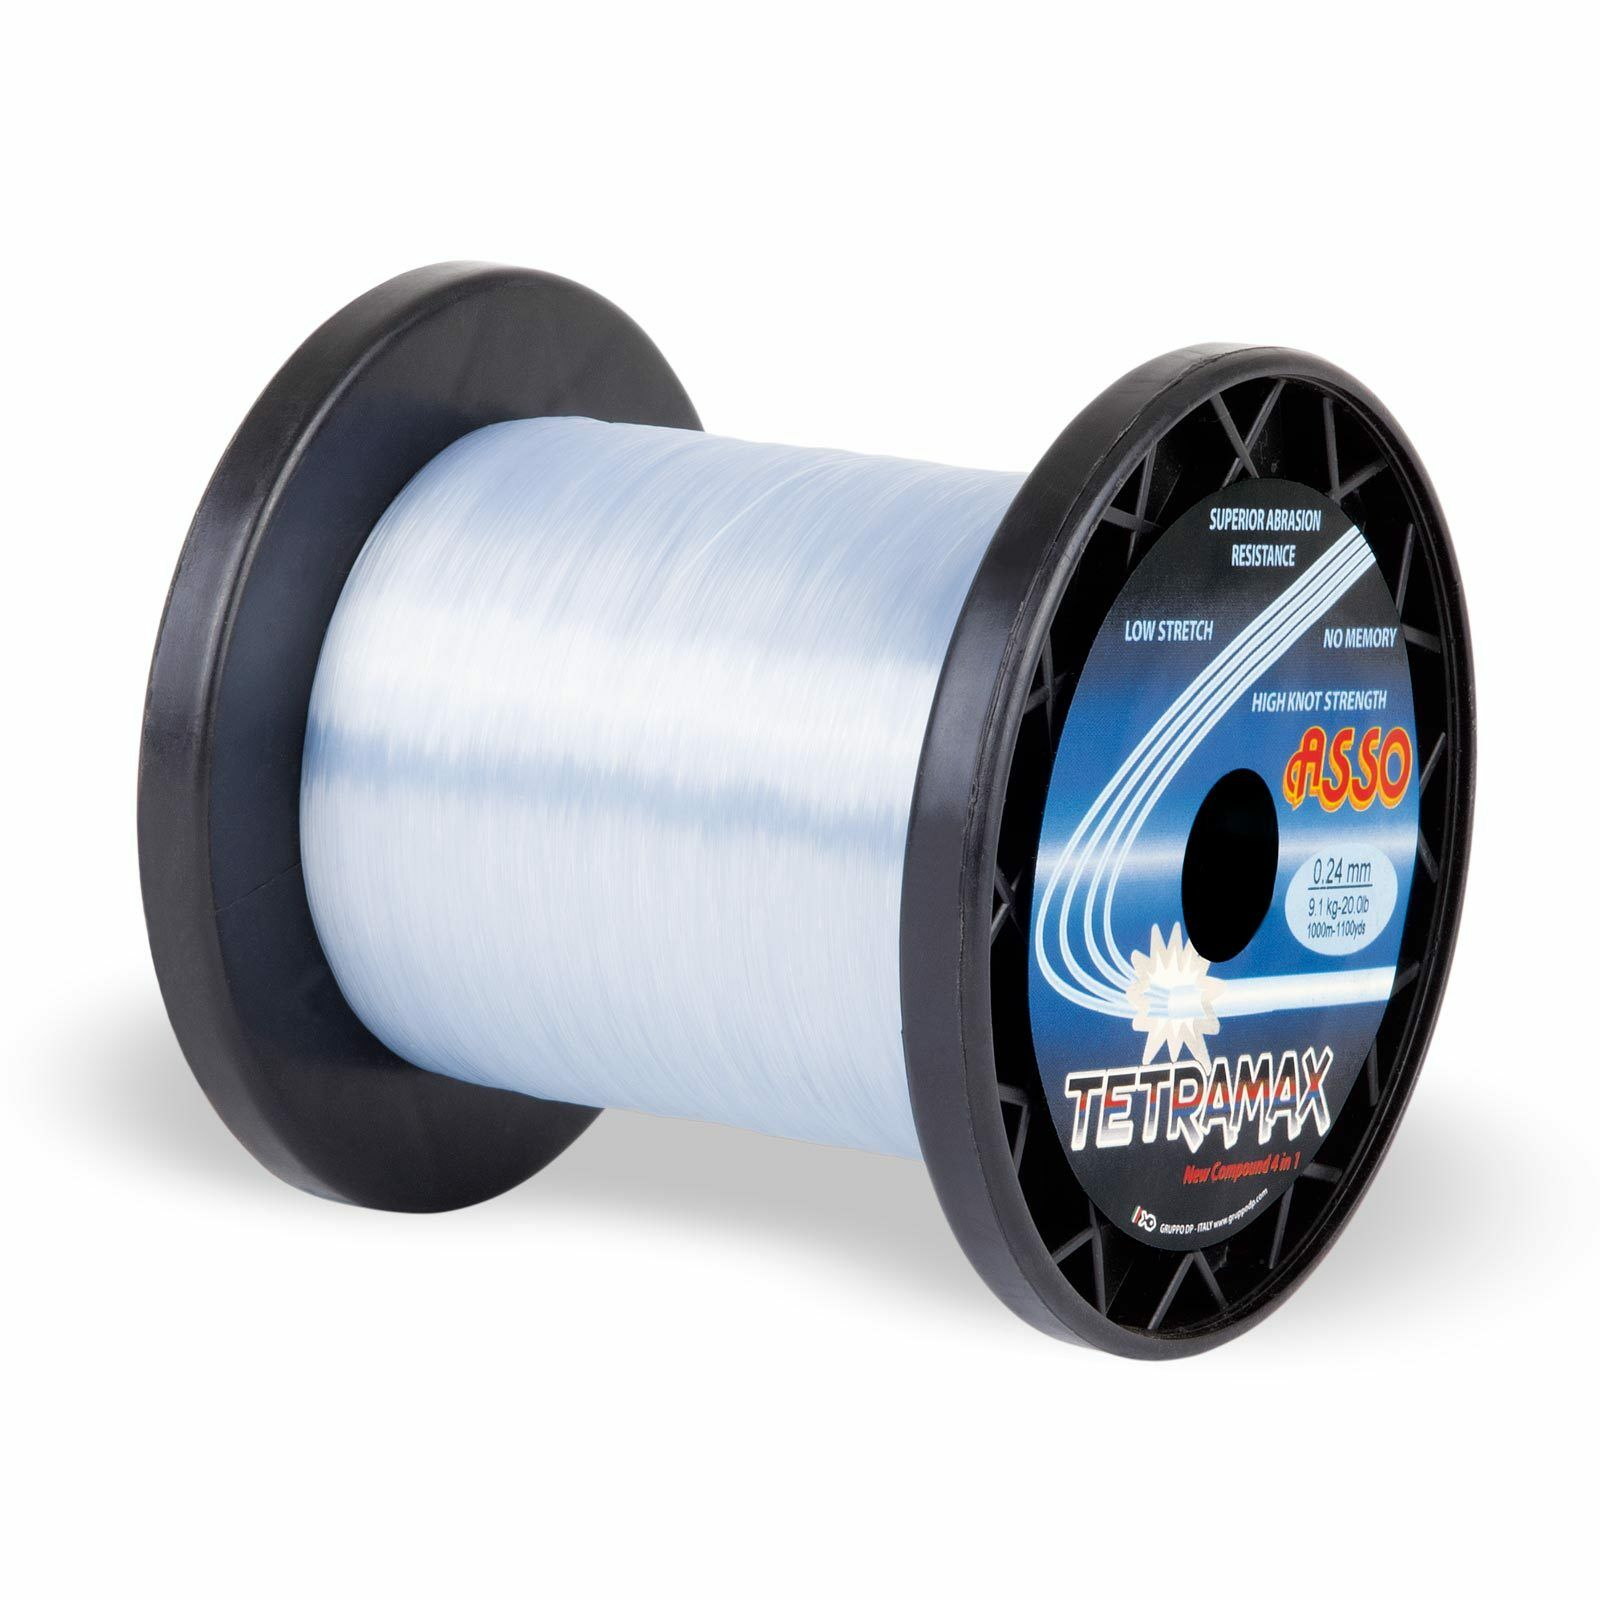 0,06eurm ASSO monofili lenza TETRAMAX MONO 1000m 0,40mm 11,90kg blu